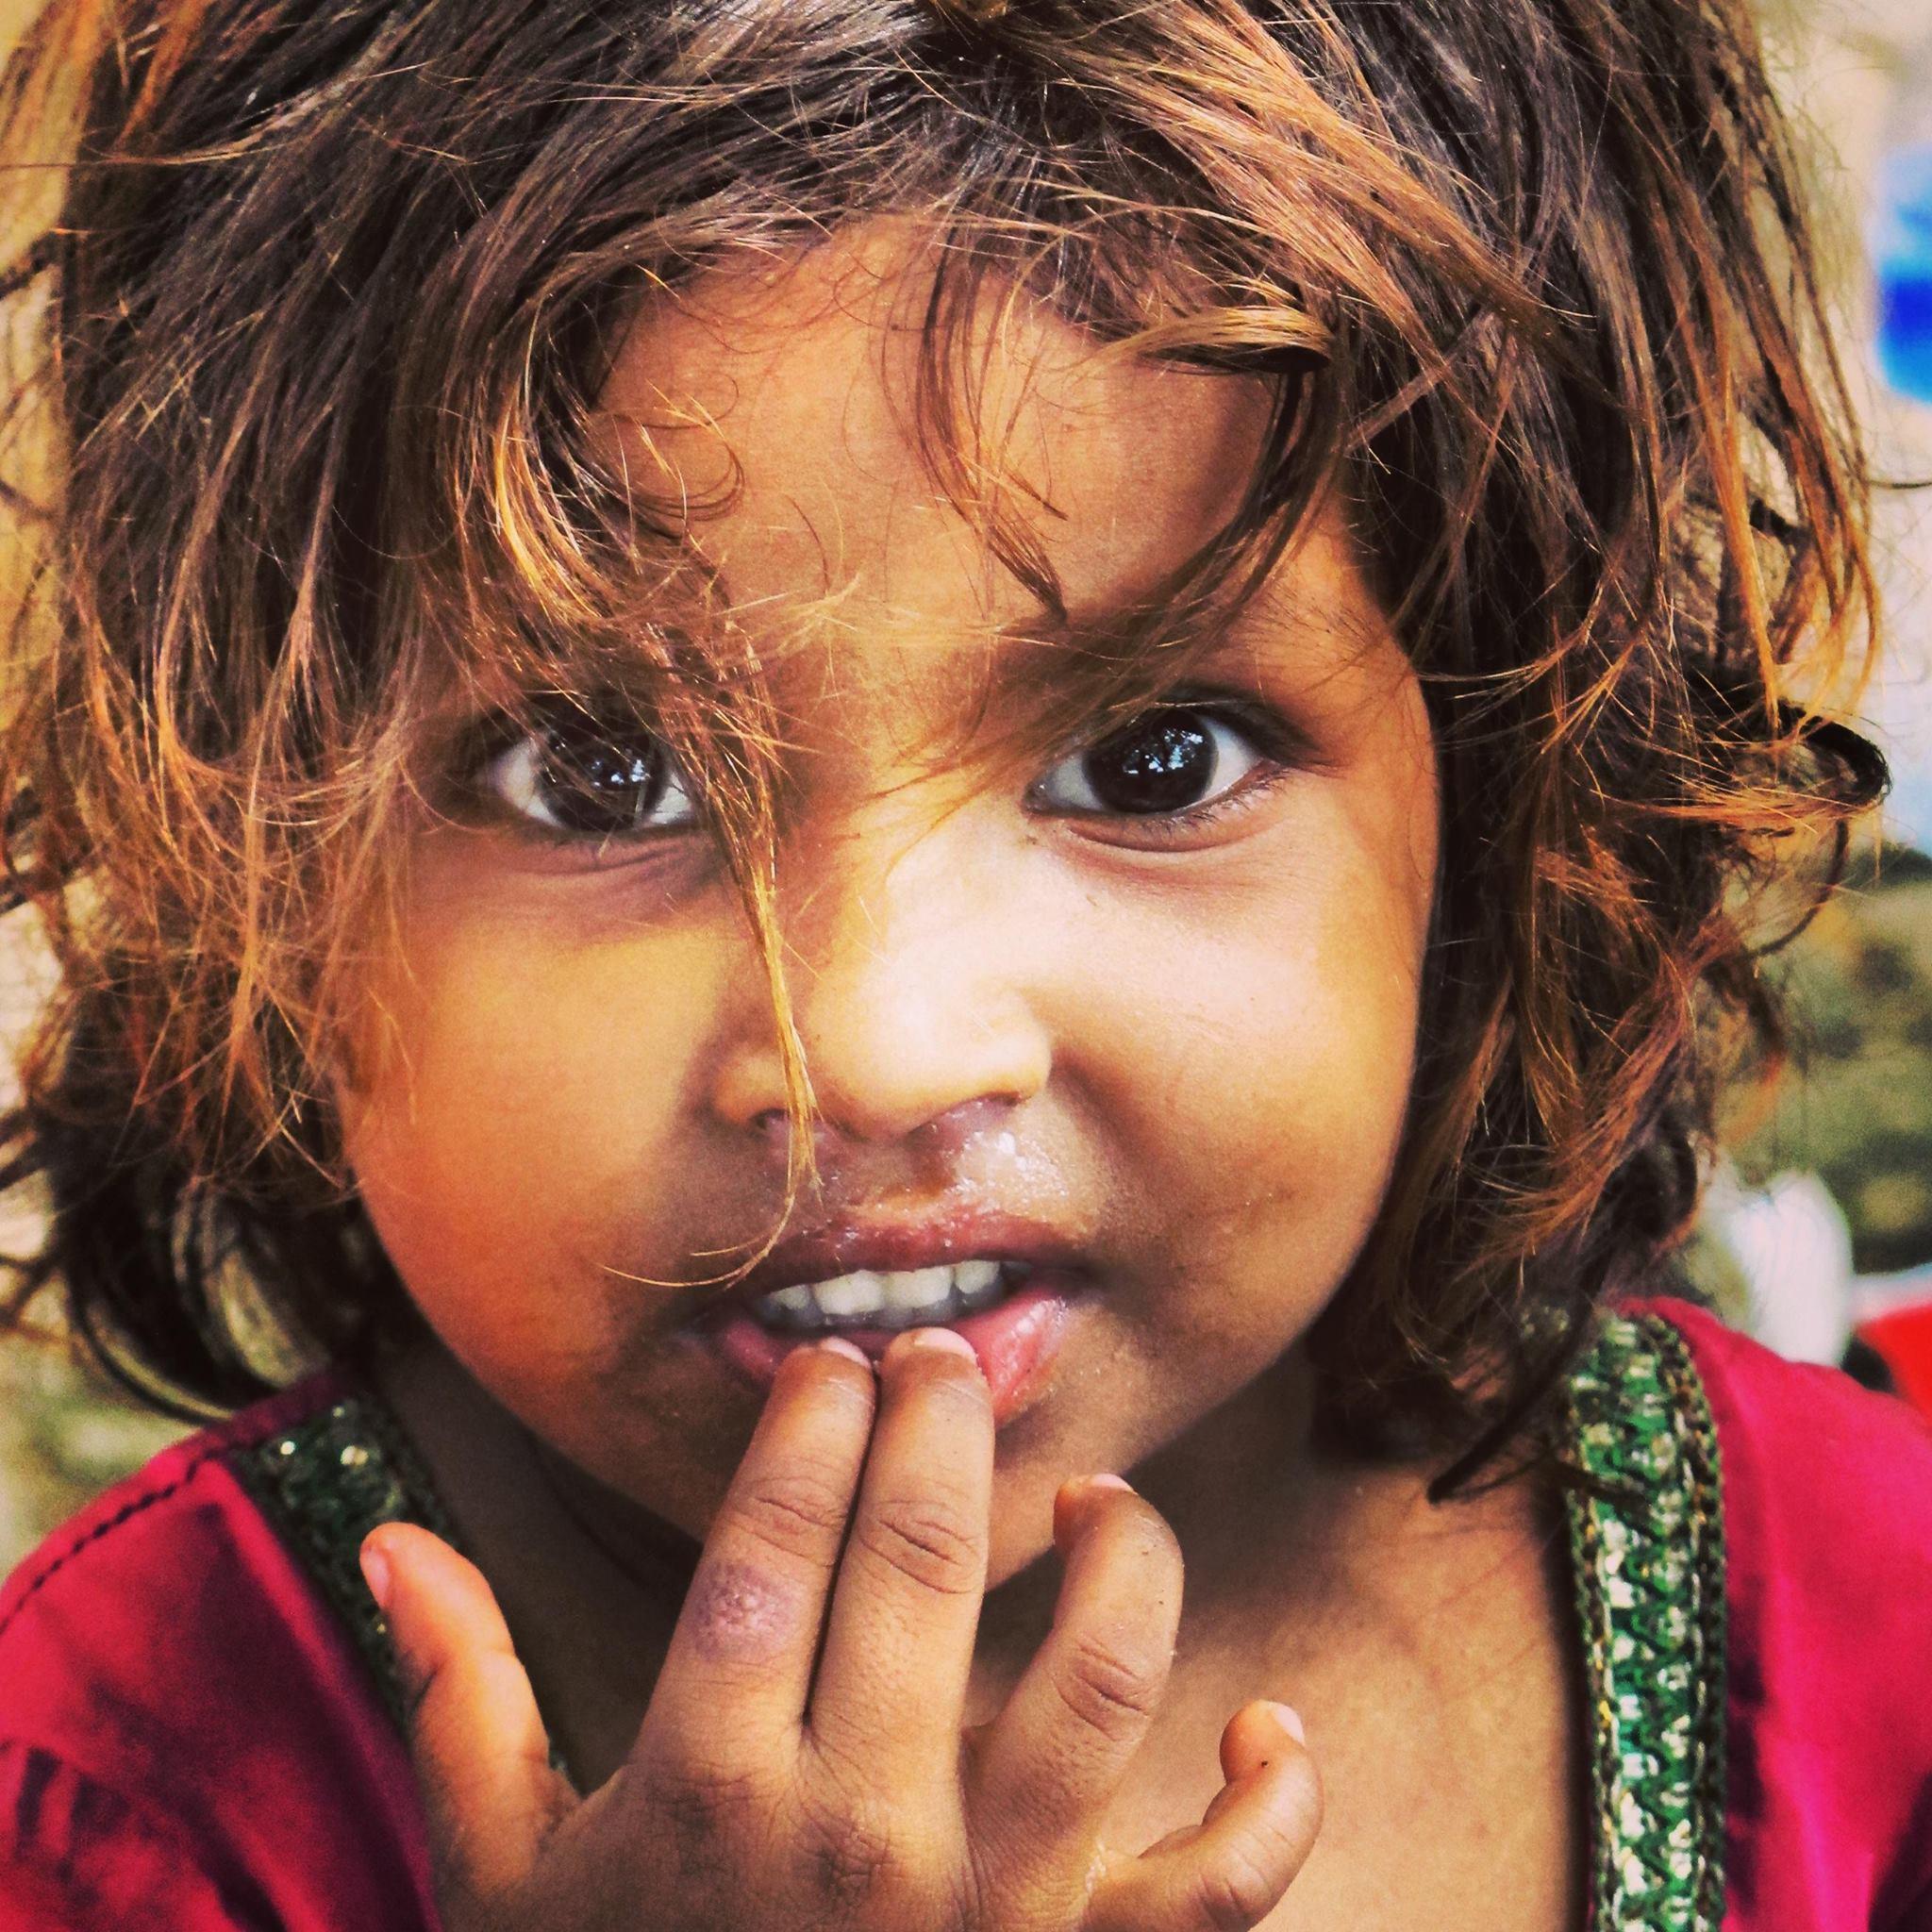 Ojo seco: una dolorosa mirada